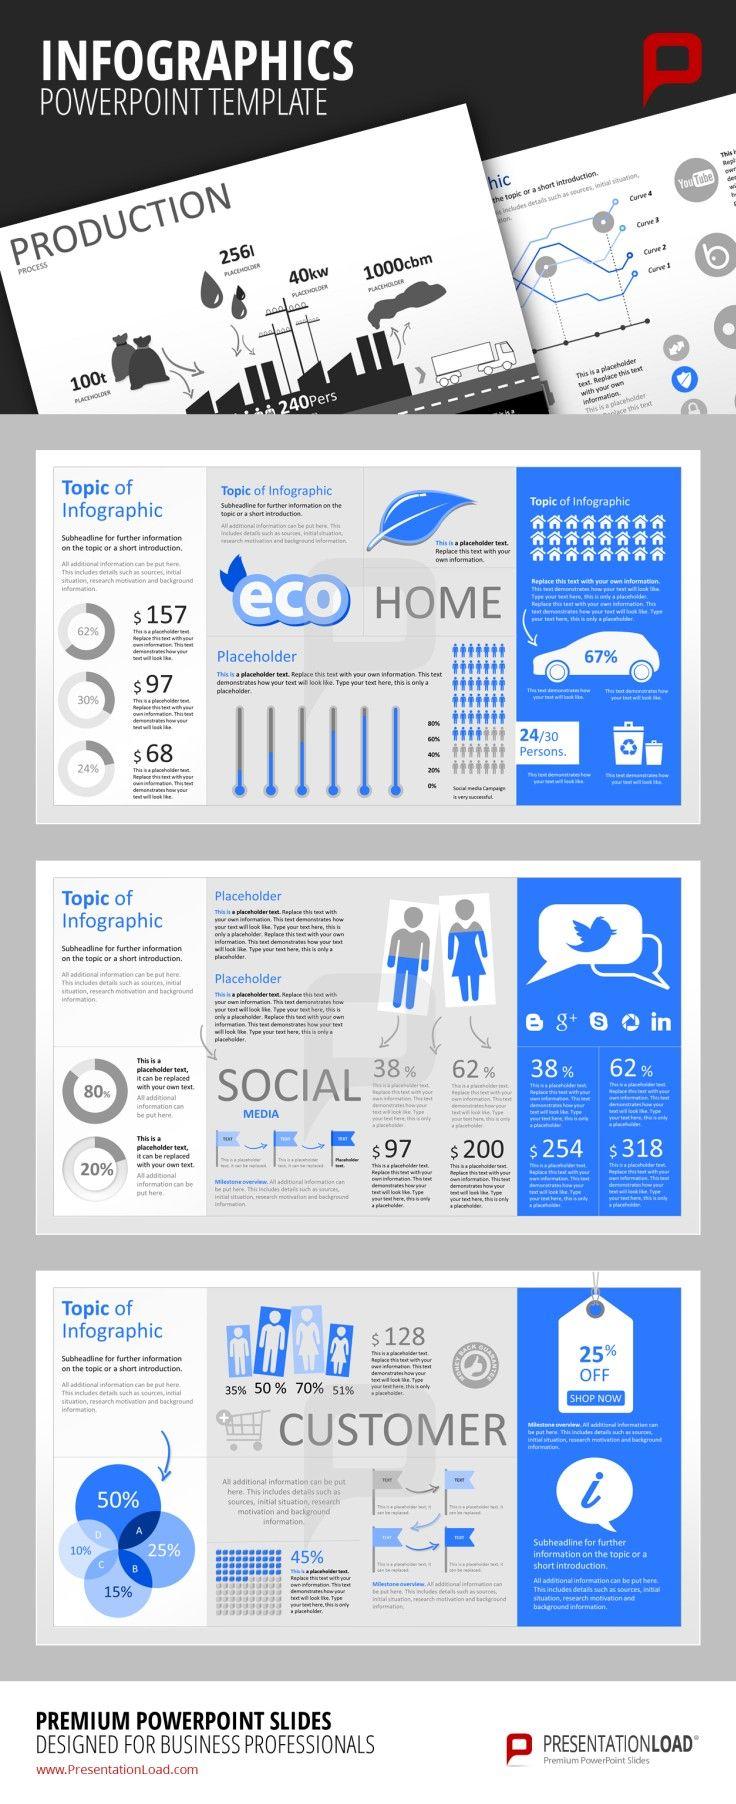 Infographic powerpoint templates create marketing related infographic powerpoint templates create marketing related infographics regarding the impact of social media marketing strategies or toneelgroepblik Images